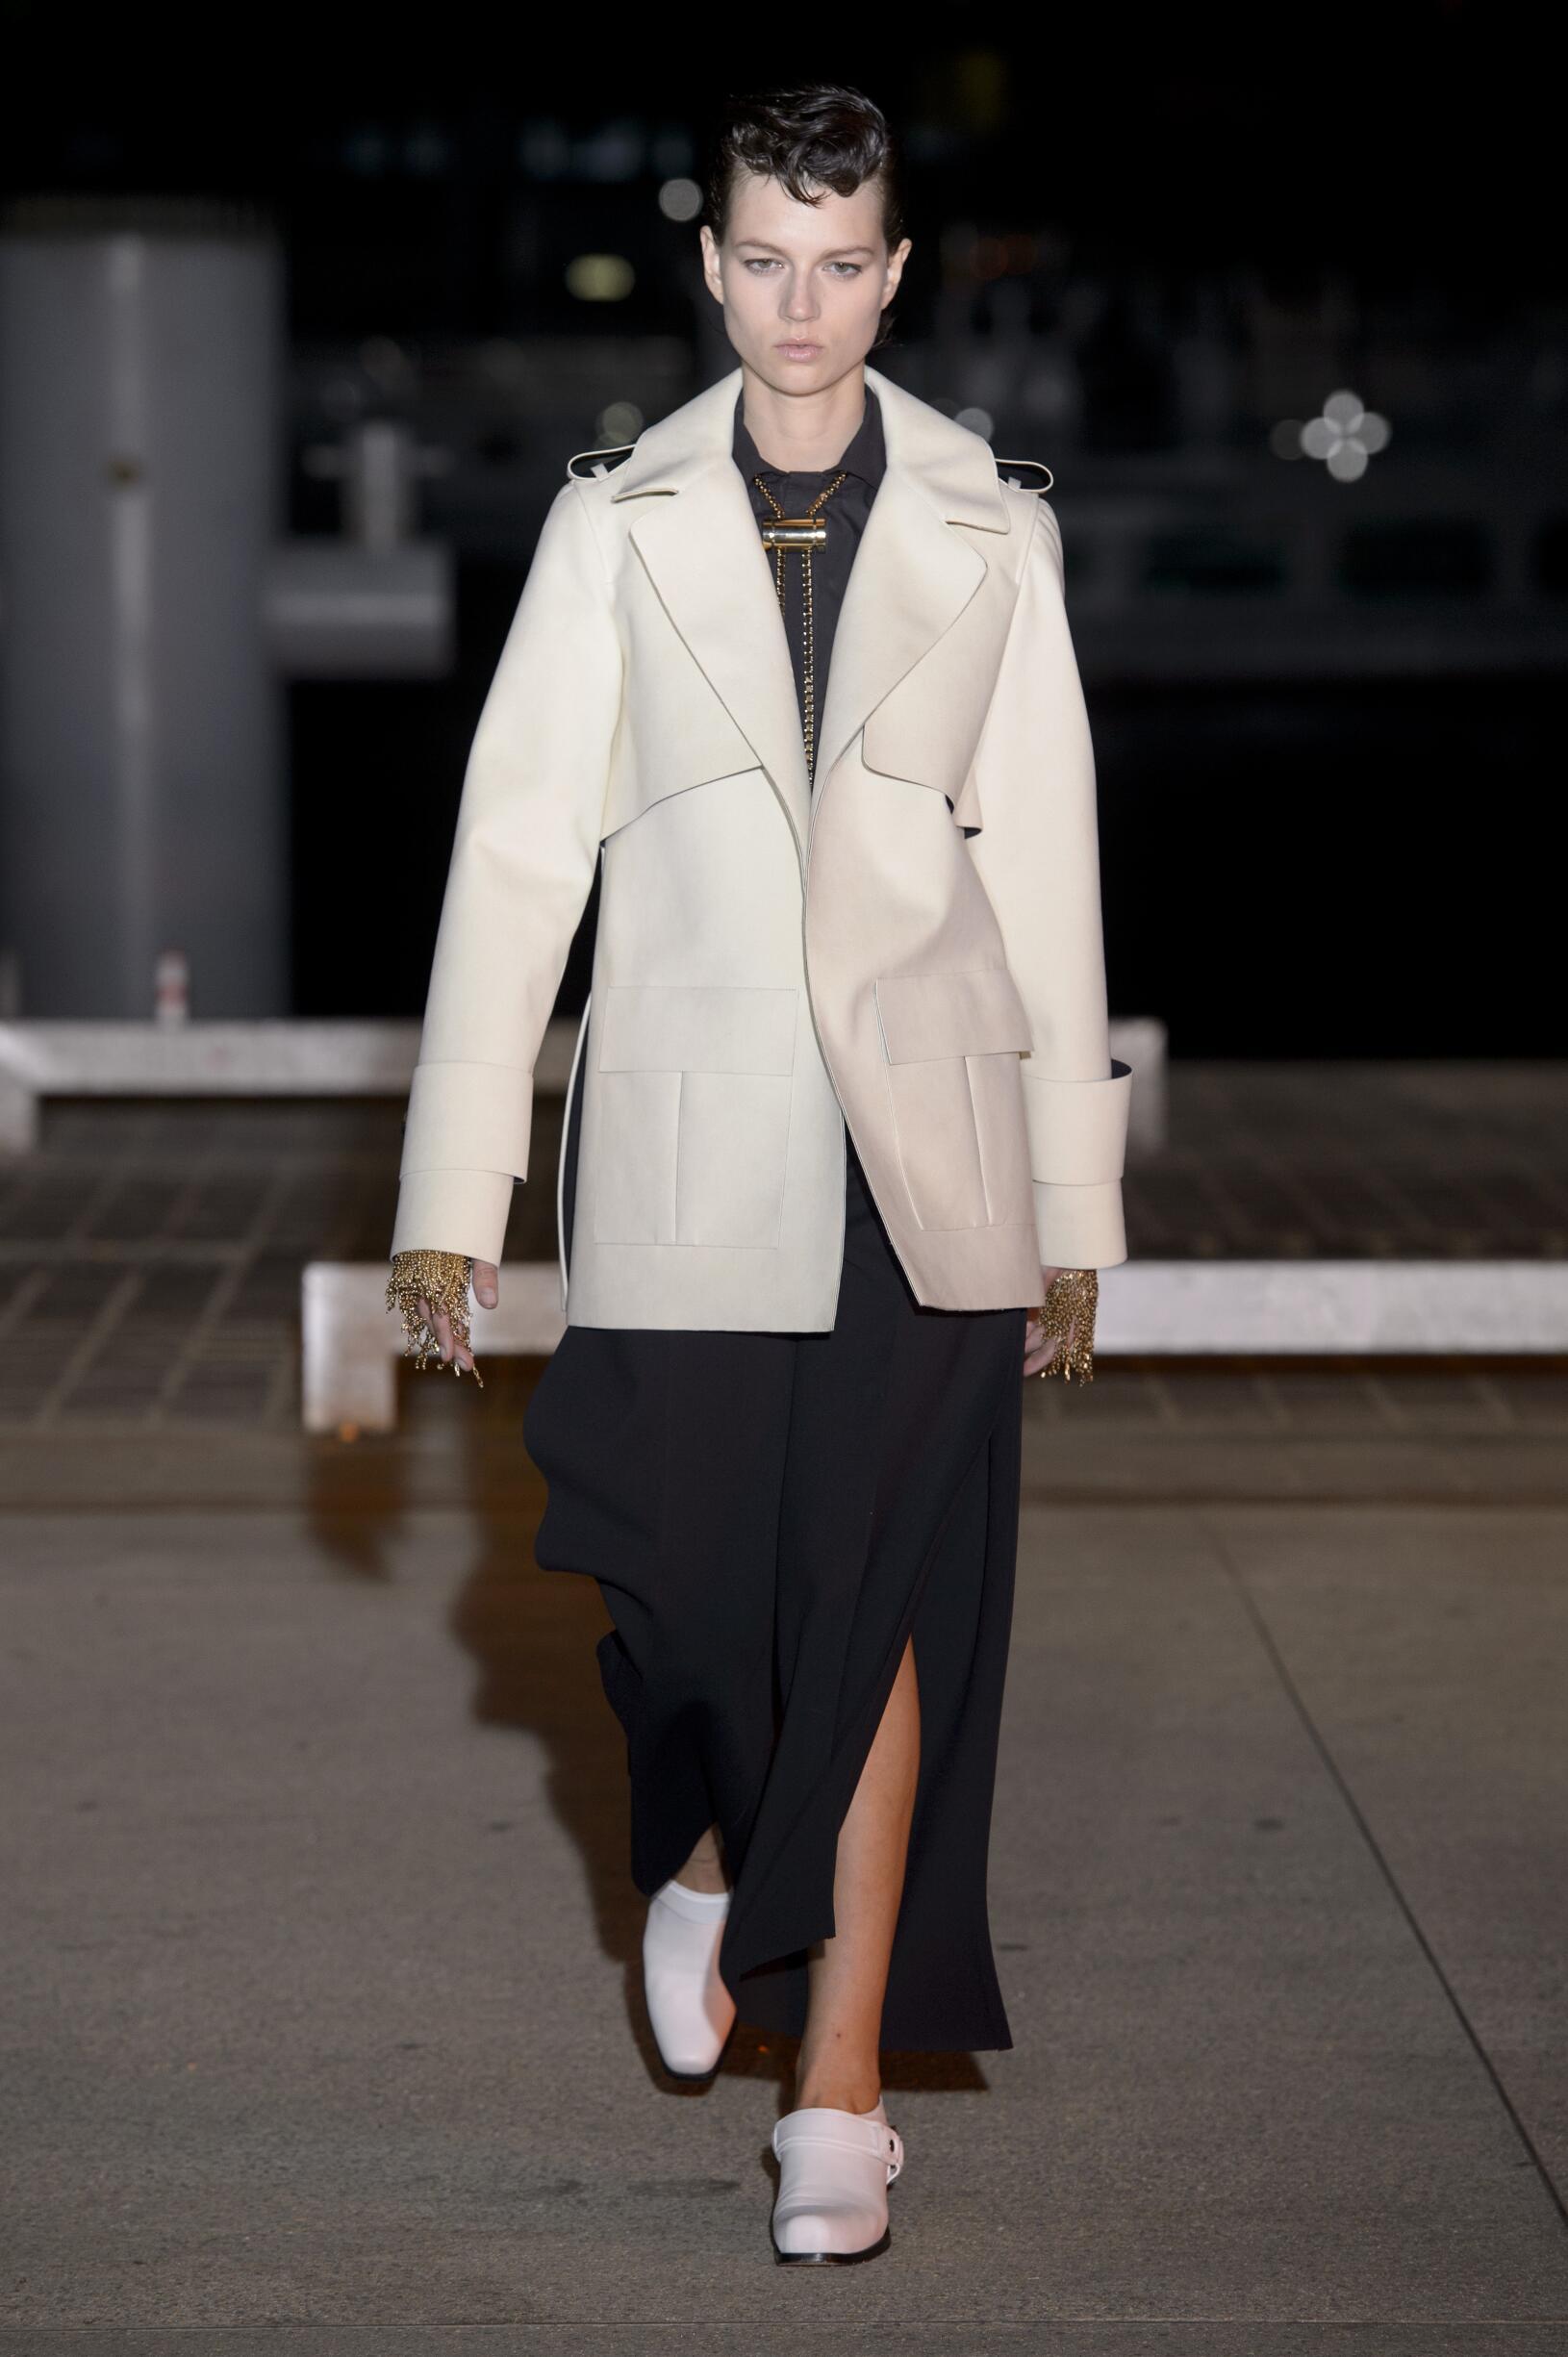 Spring 2017 Womenswear Wanda Nylon